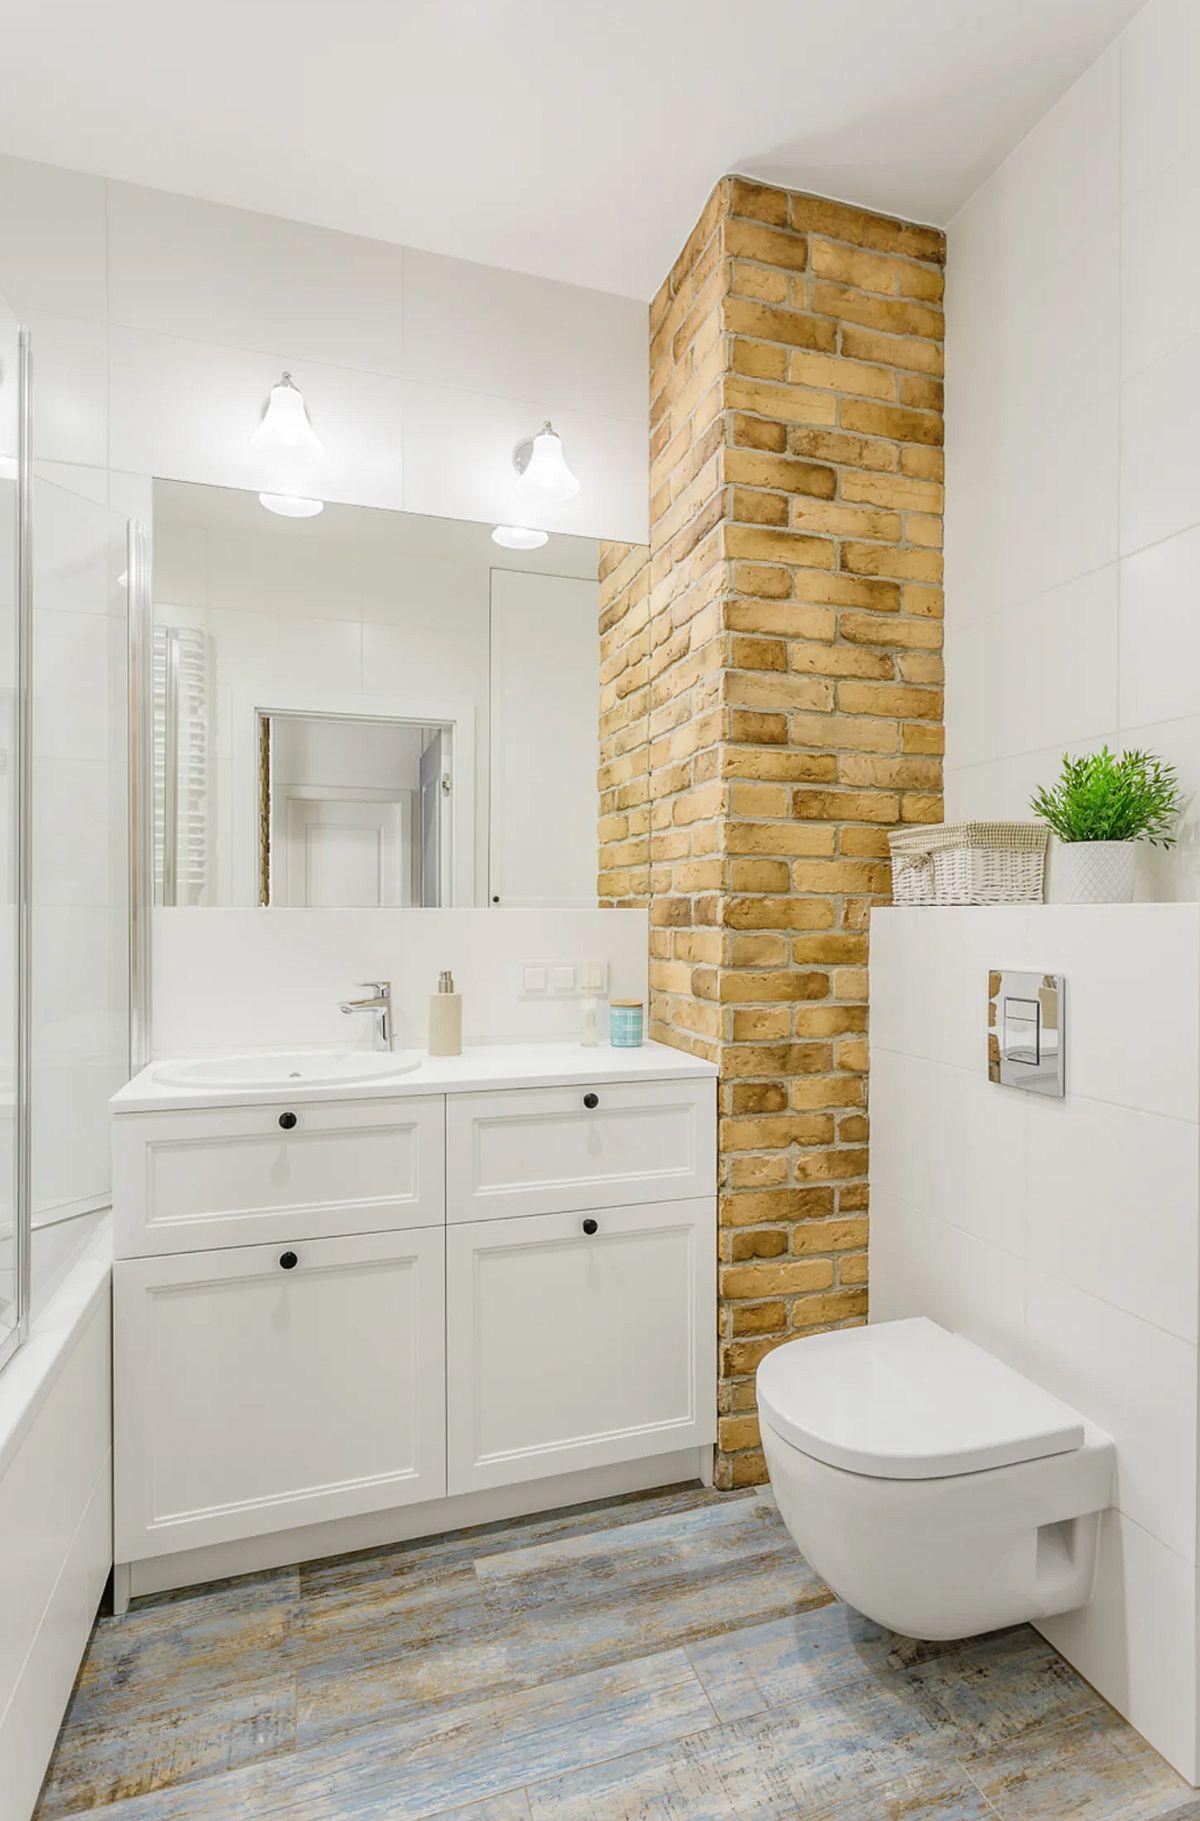 adelaparvu.com despre apartament 40 mp in stil marin, design Zawicka-ID, Foto Michal Mlynarczyk (11)